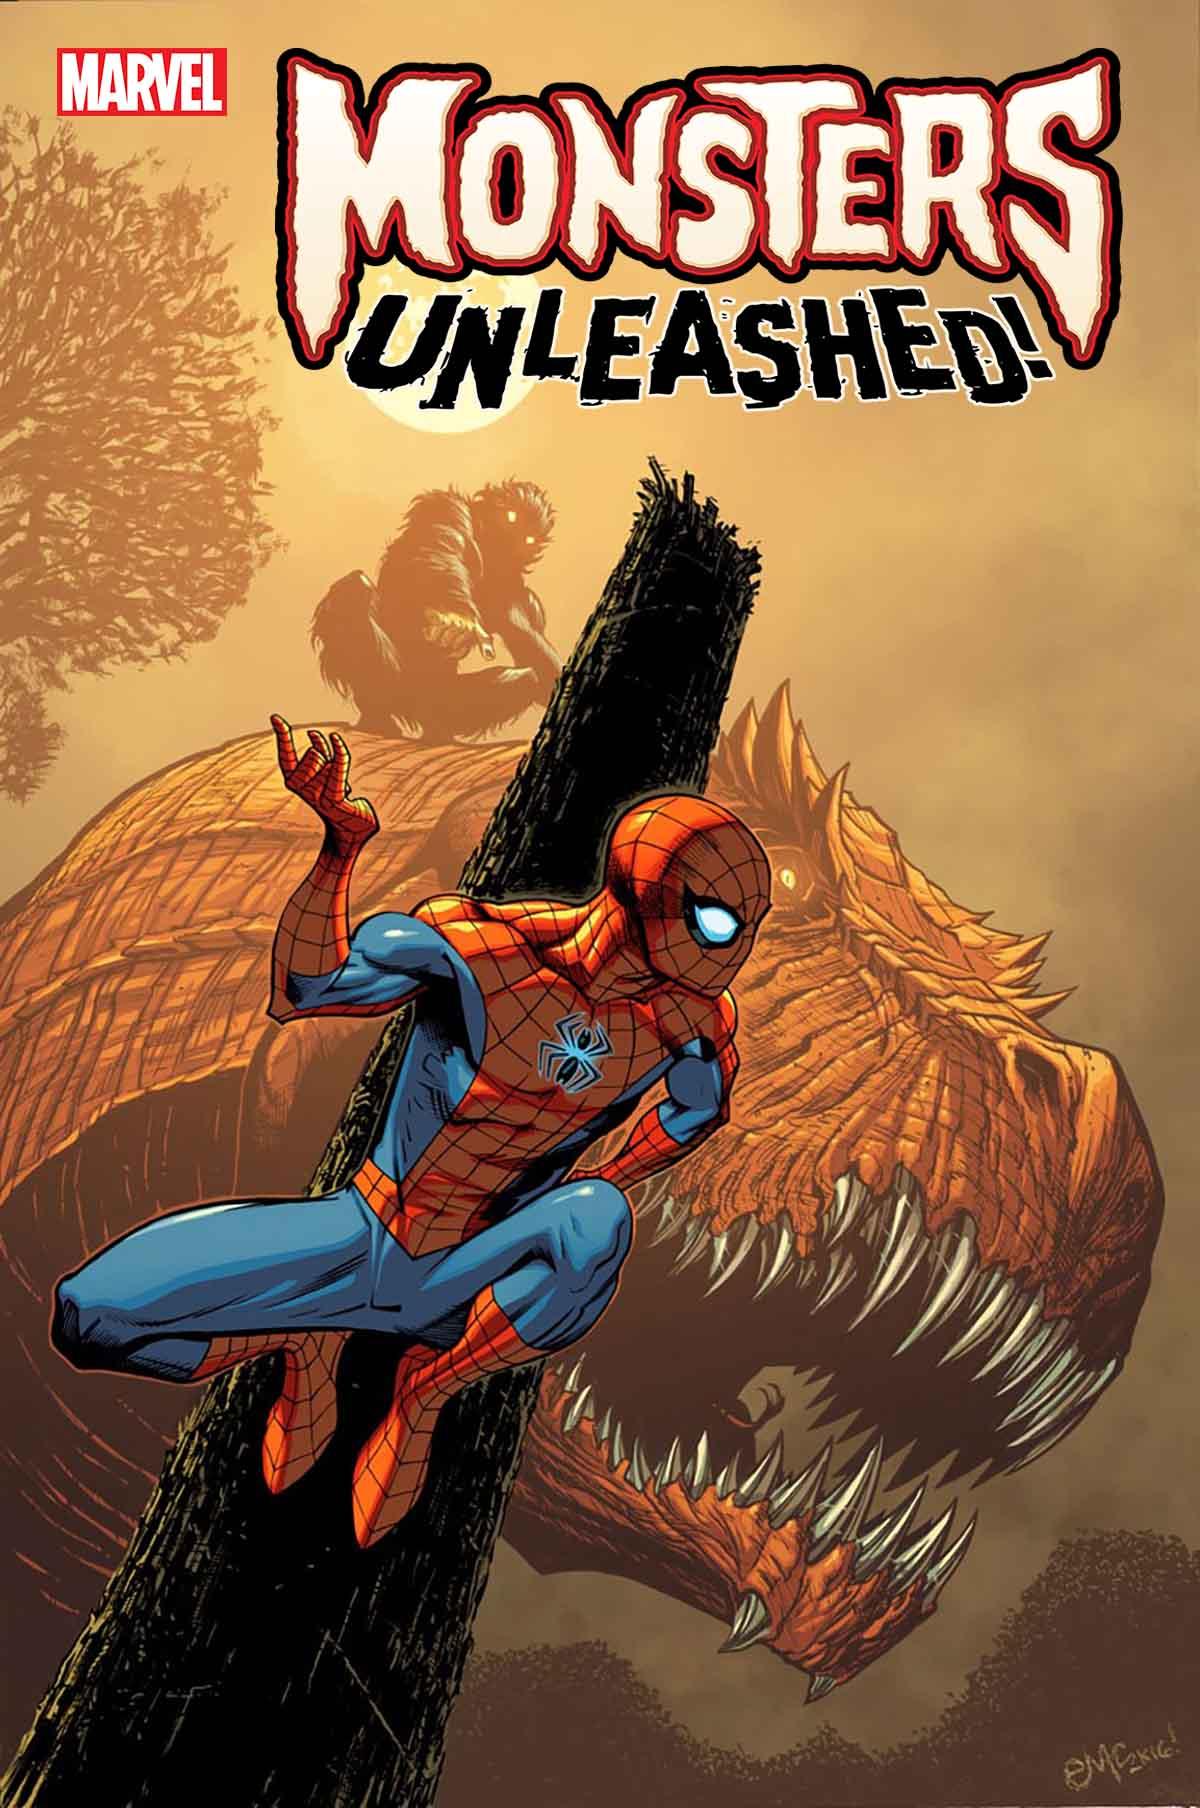 marvel-reveals-monsters-unleashed-variant-cover-art4